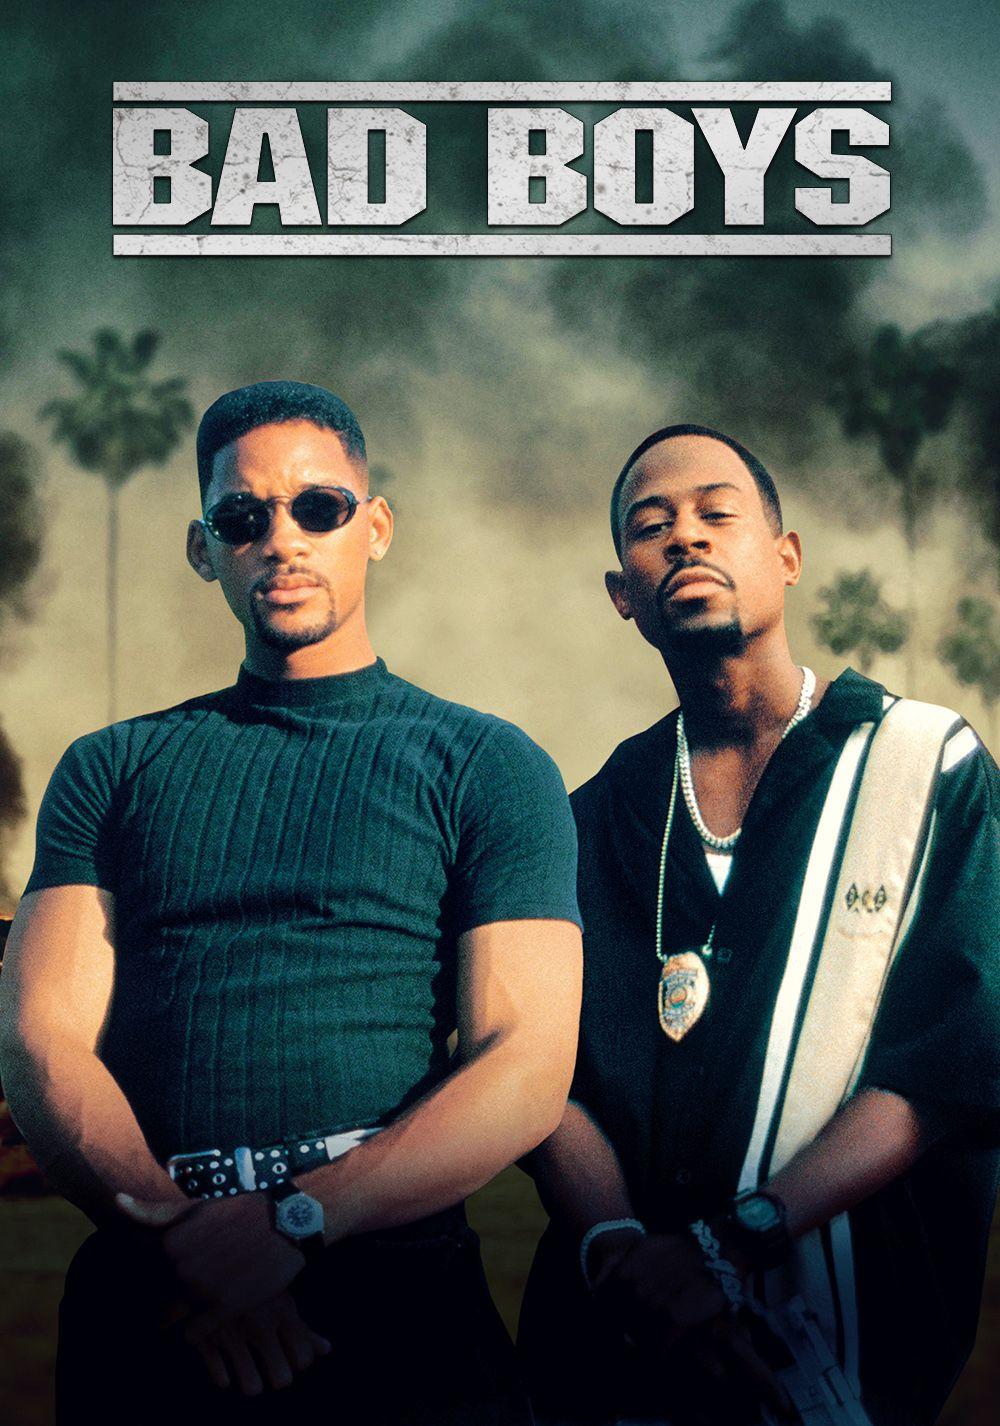 Bad Boys 1995 Whatcha Gonna Do Bad Boys 1995 Movies For Boys Bad Boys Movie